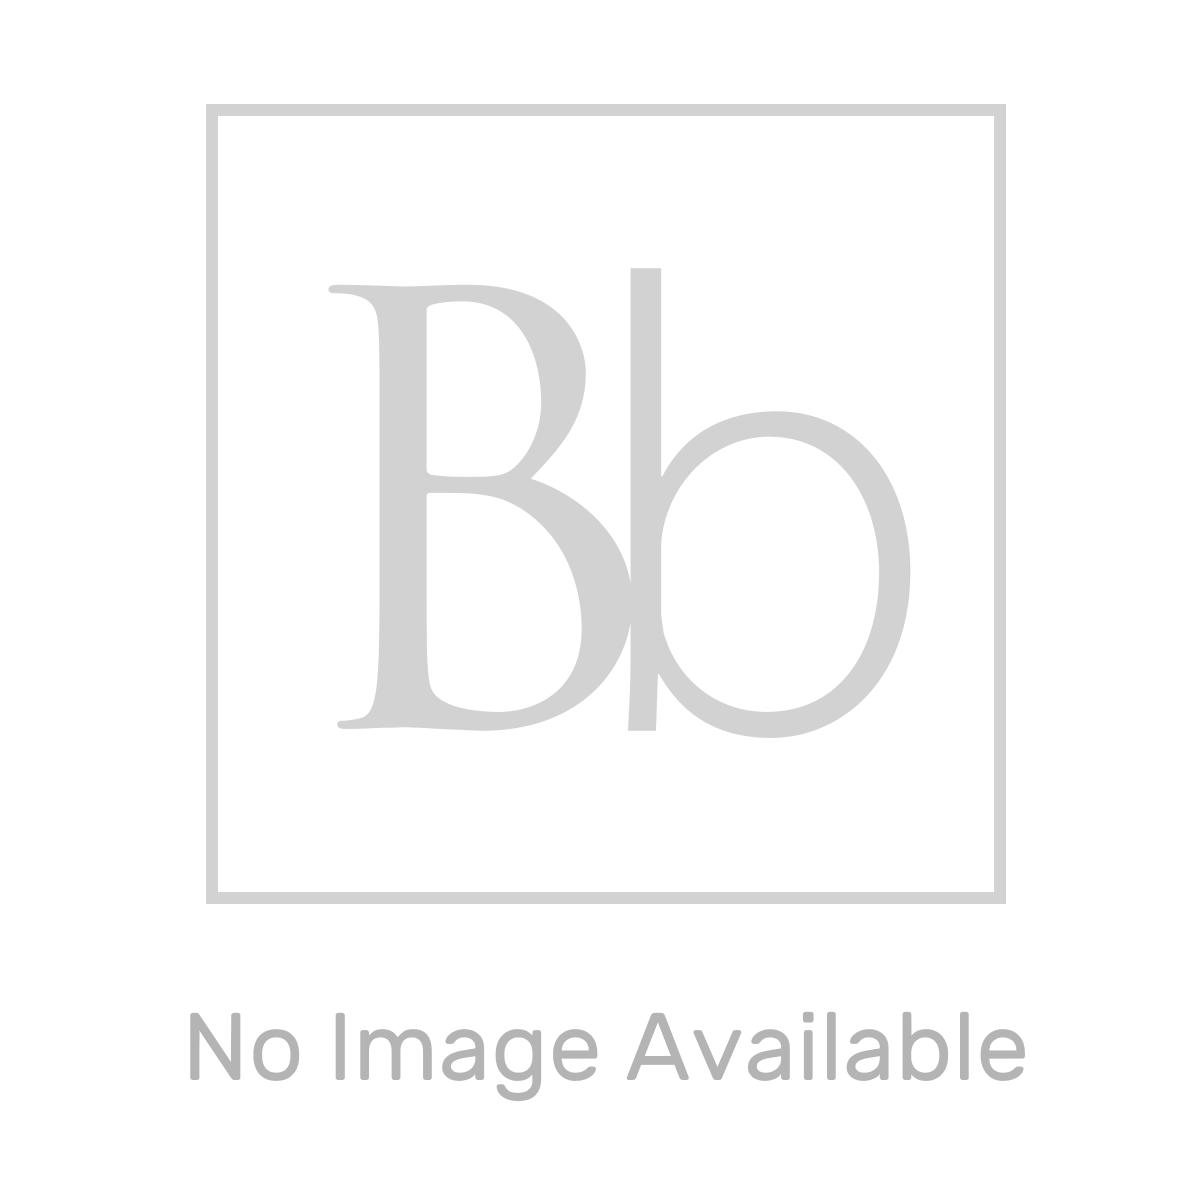 Ikoma White Gloss 4 Drawer Unit Roomset